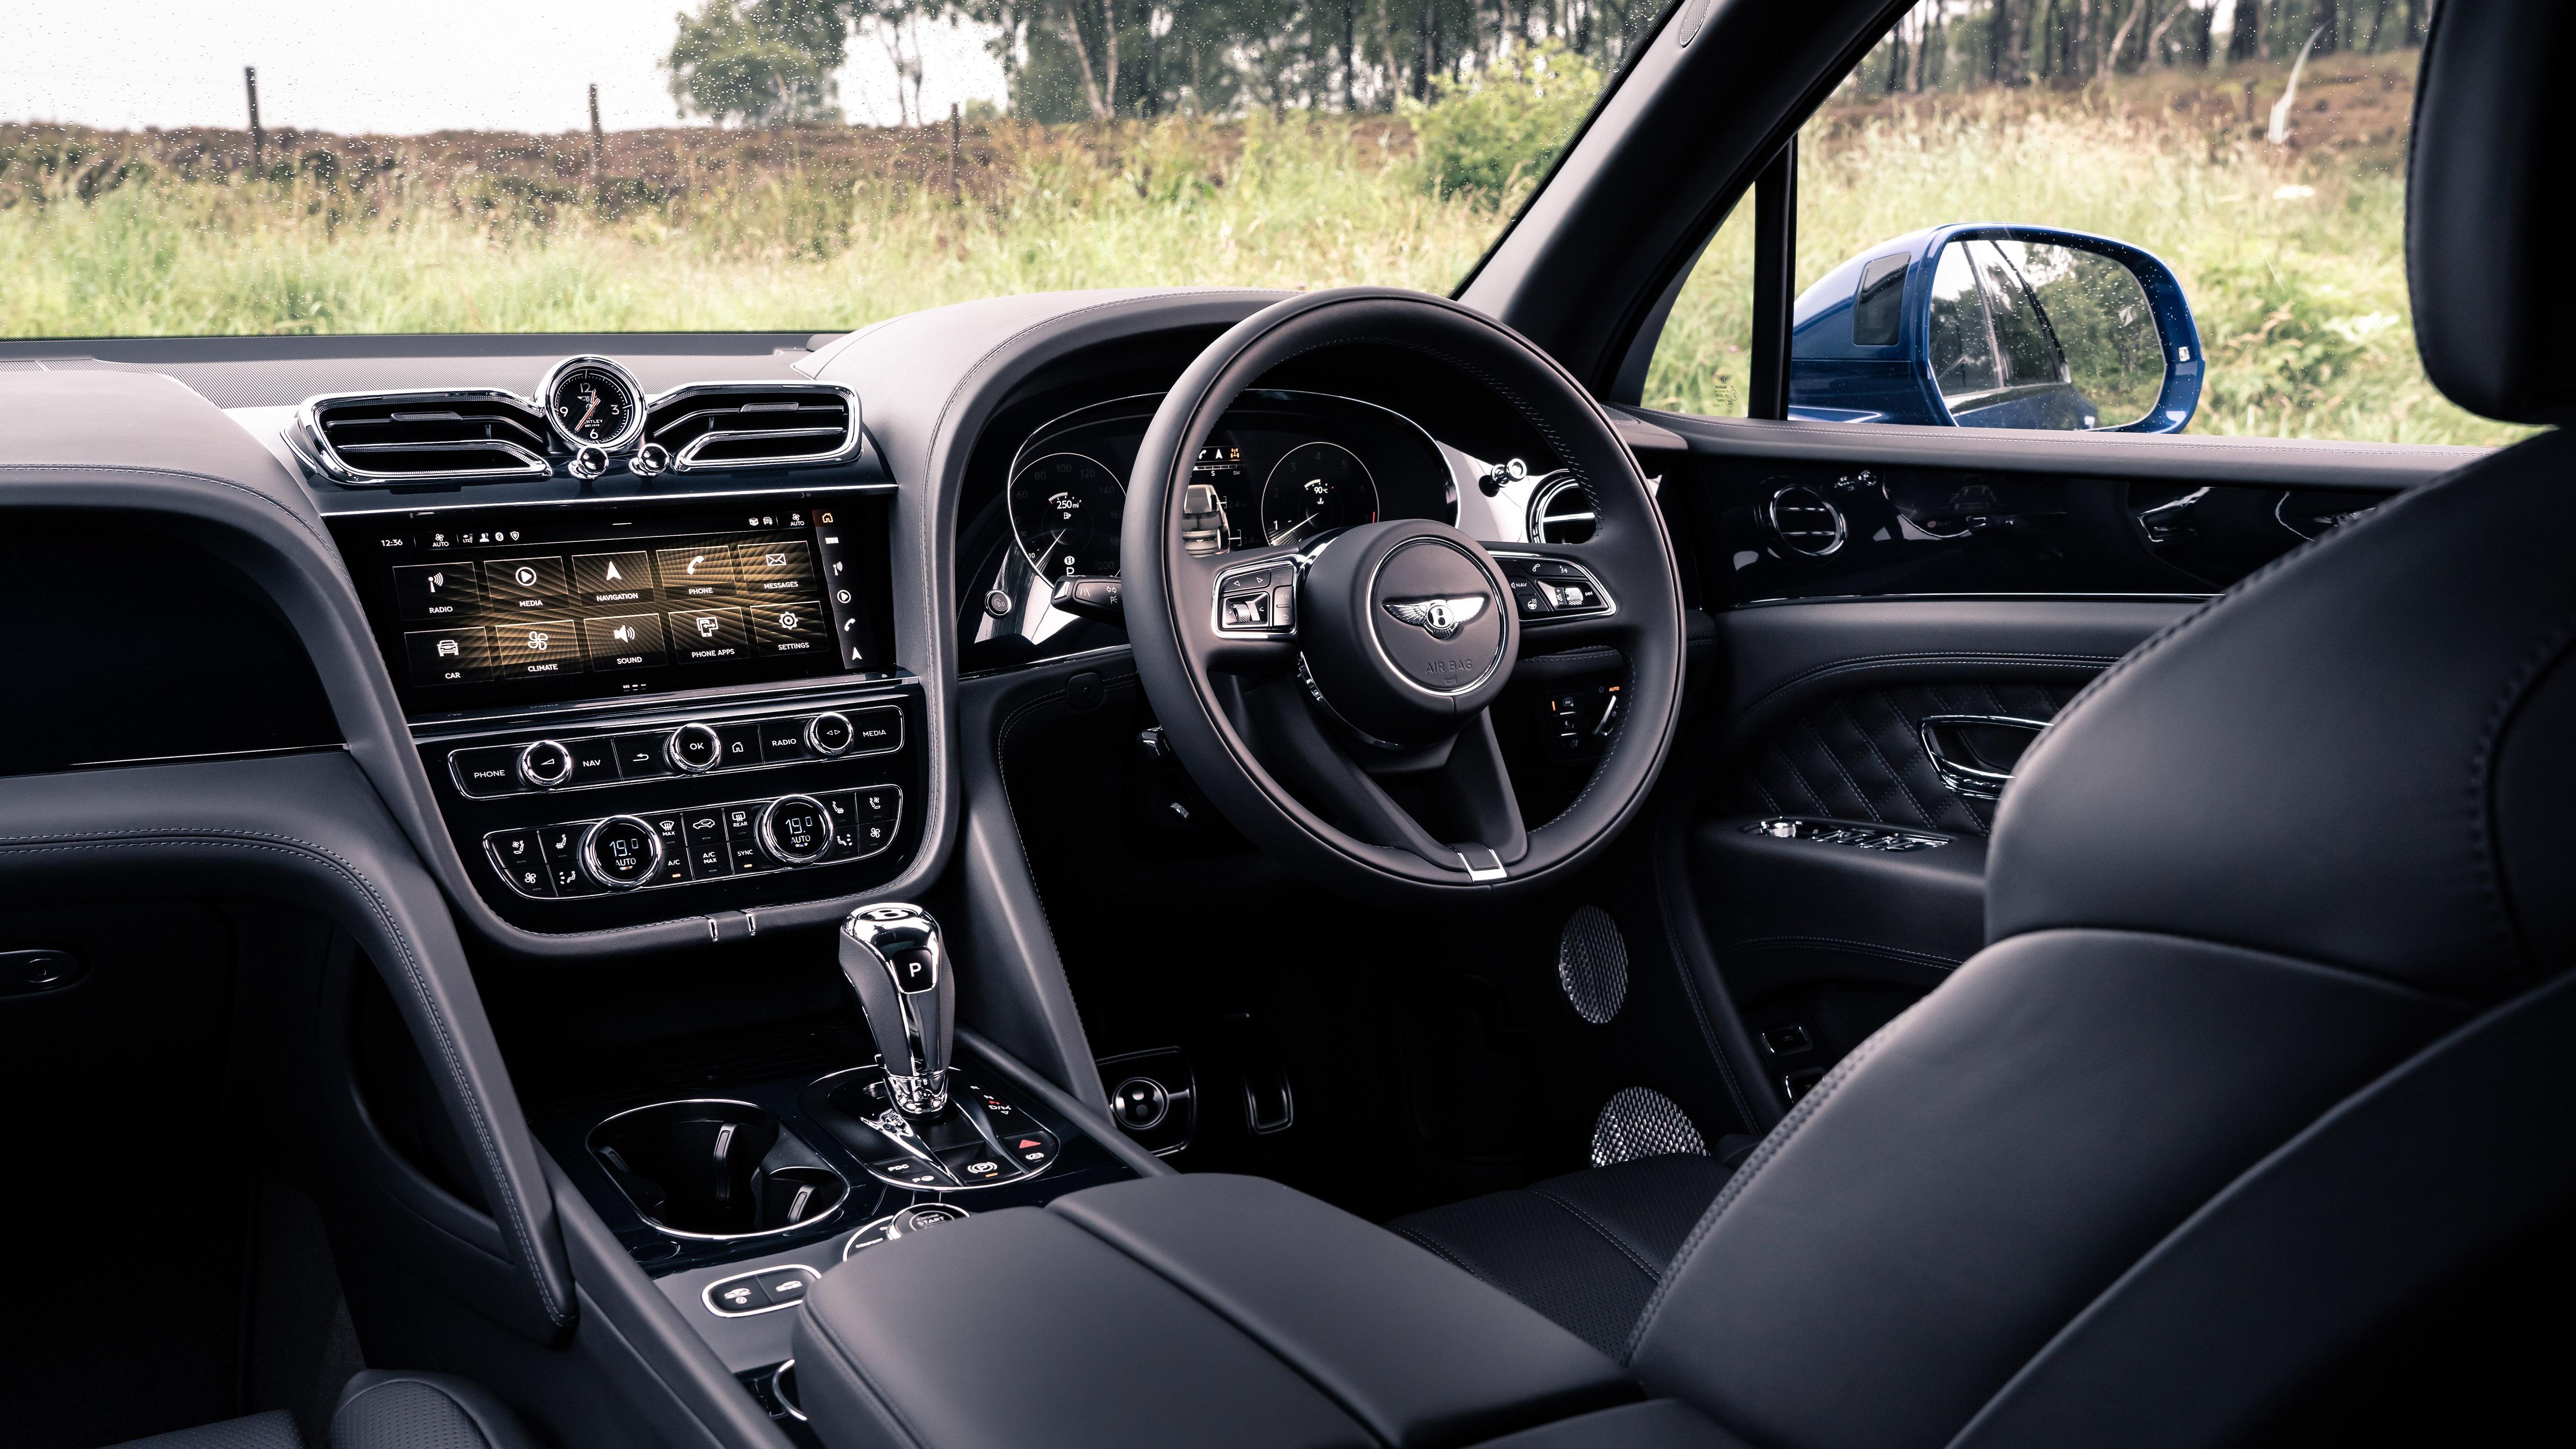 Bentley Bentayga V8 First Edition 2020 5k Interior Wallpaper Hd Car Wallpapers Id 15577